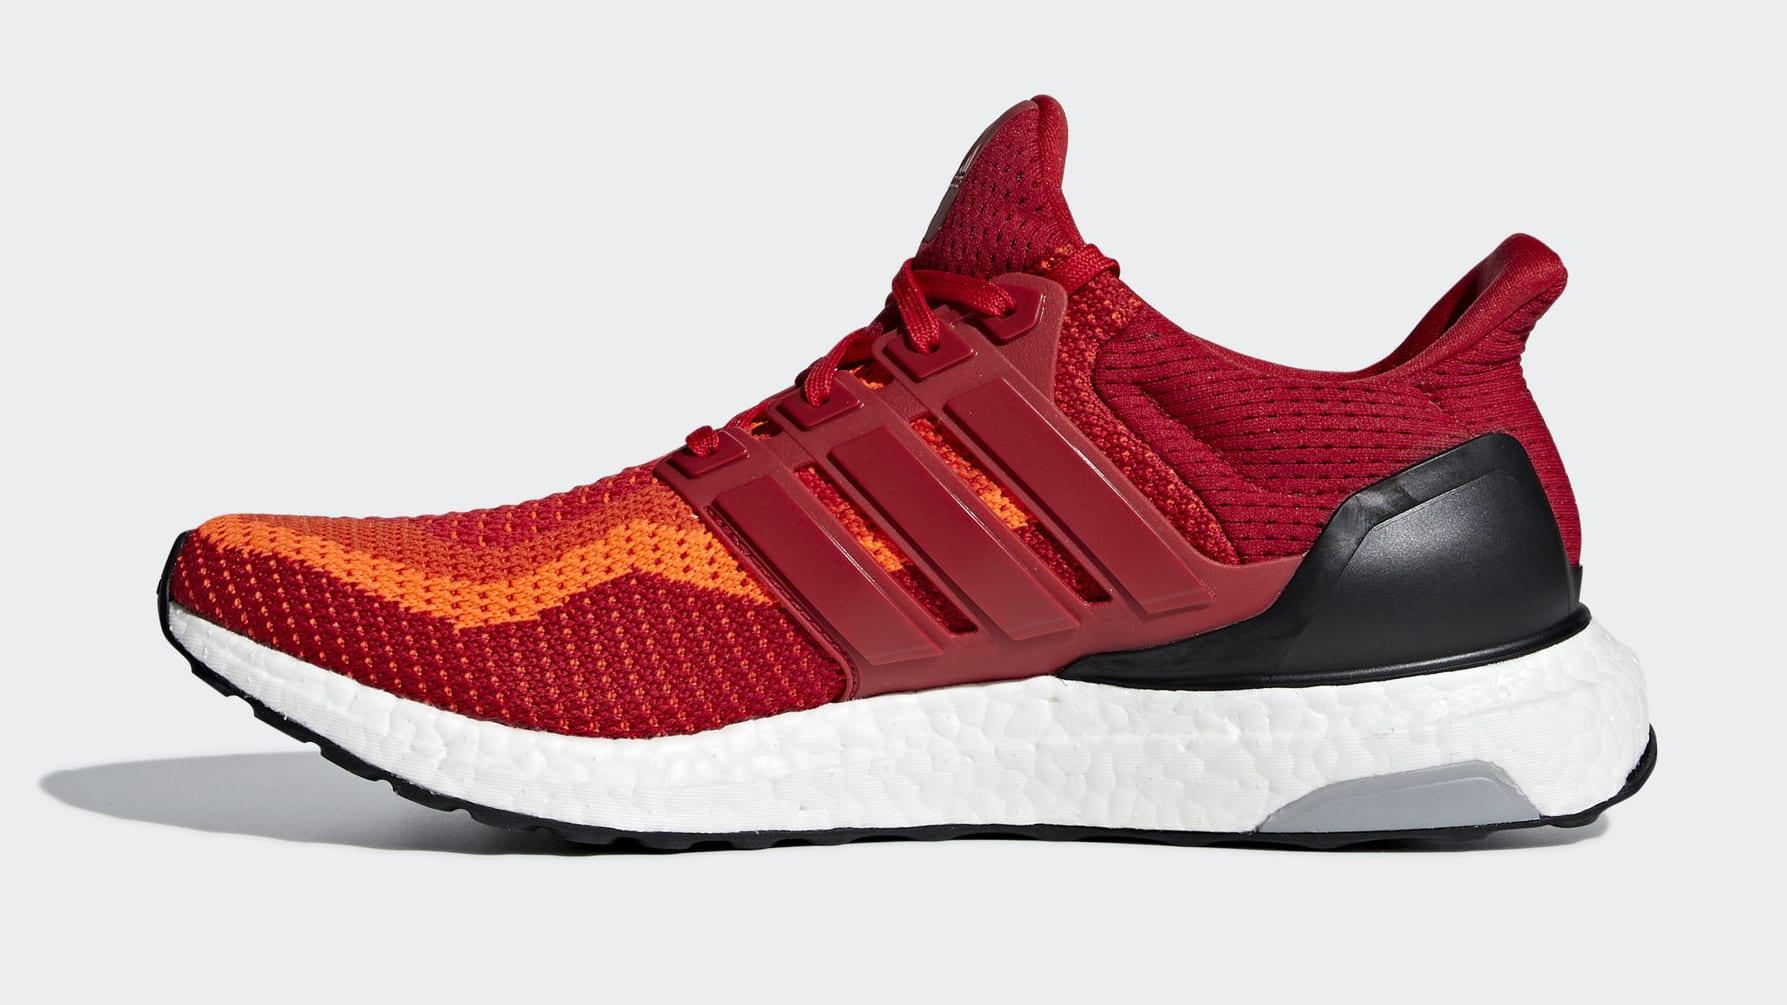 adidas-ultra-boost-2-0-red-gradient-aq4006-medial